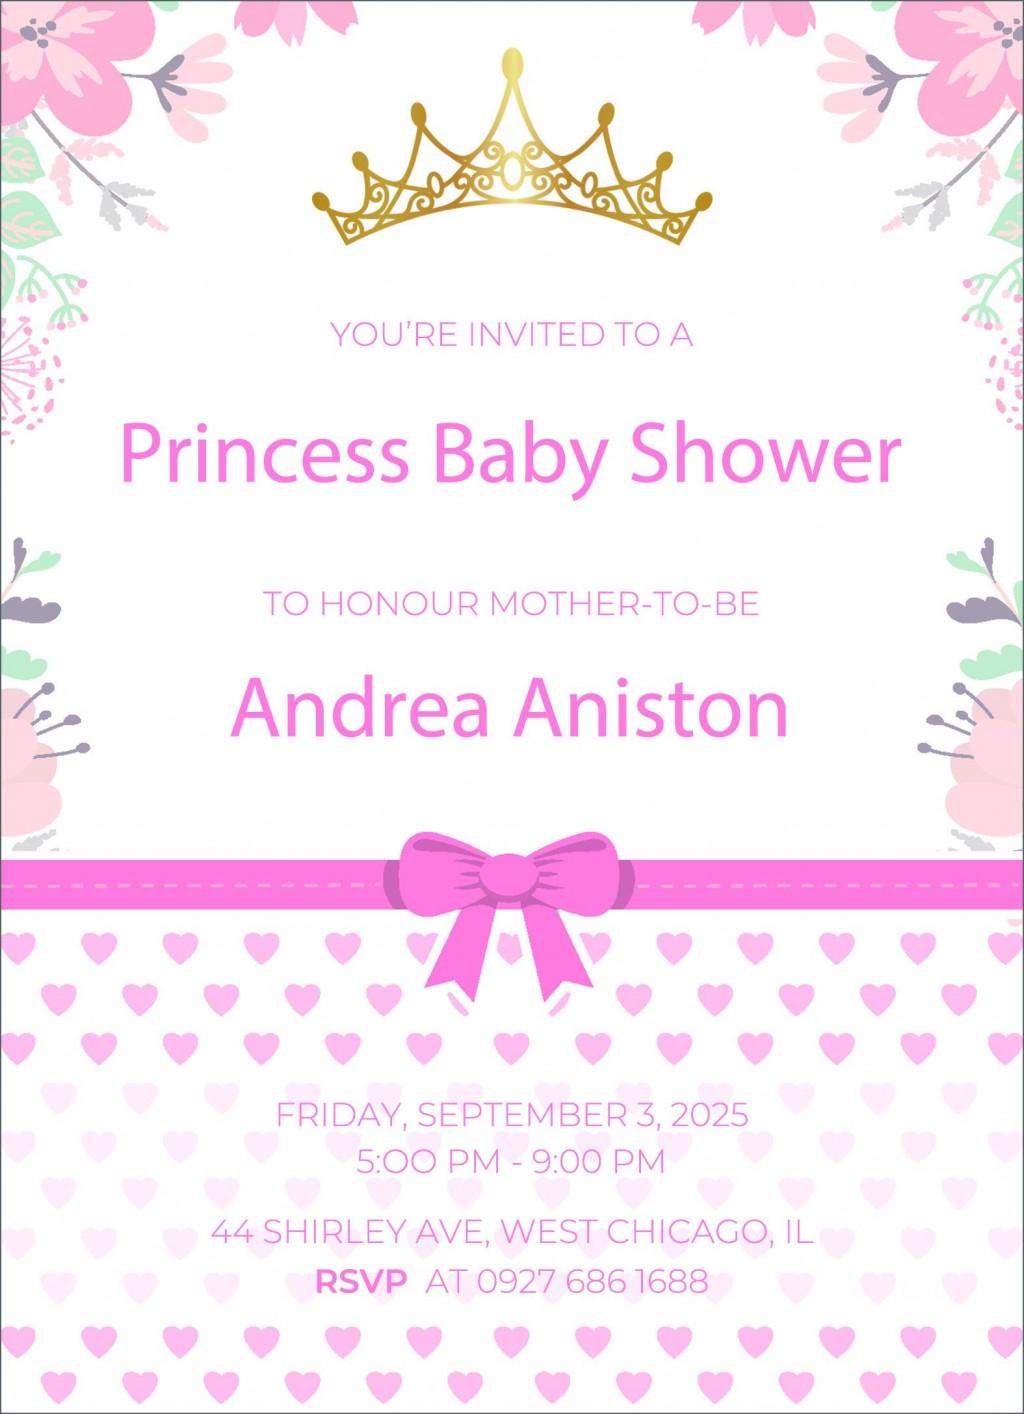 005 Incredible Diy Baby Shower Invitation Template Sample  Templates DiaperLarge